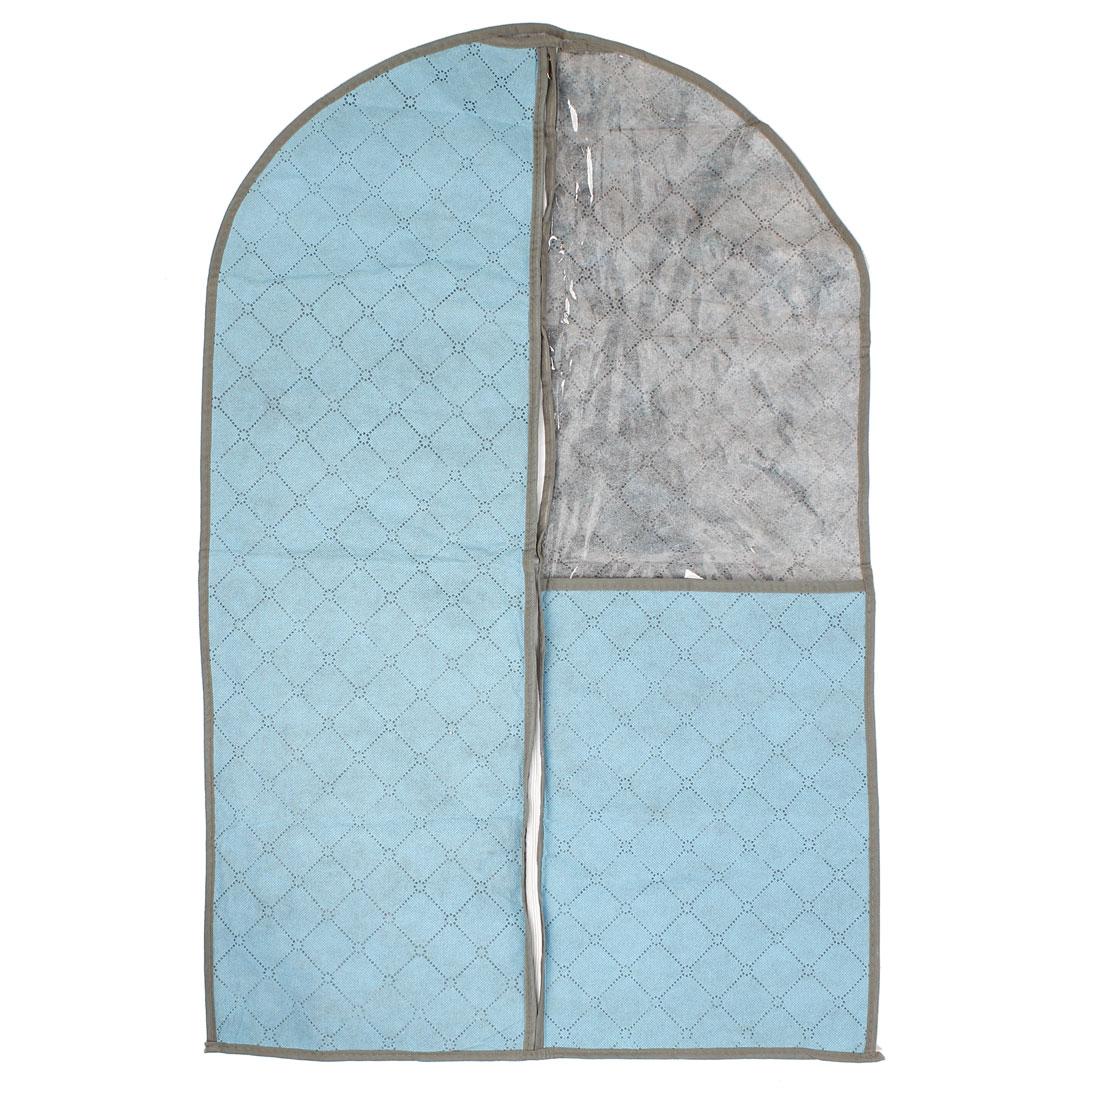 Blue Grid Print Dustproof Dress Garment Suit Cover Protector Bag for Home